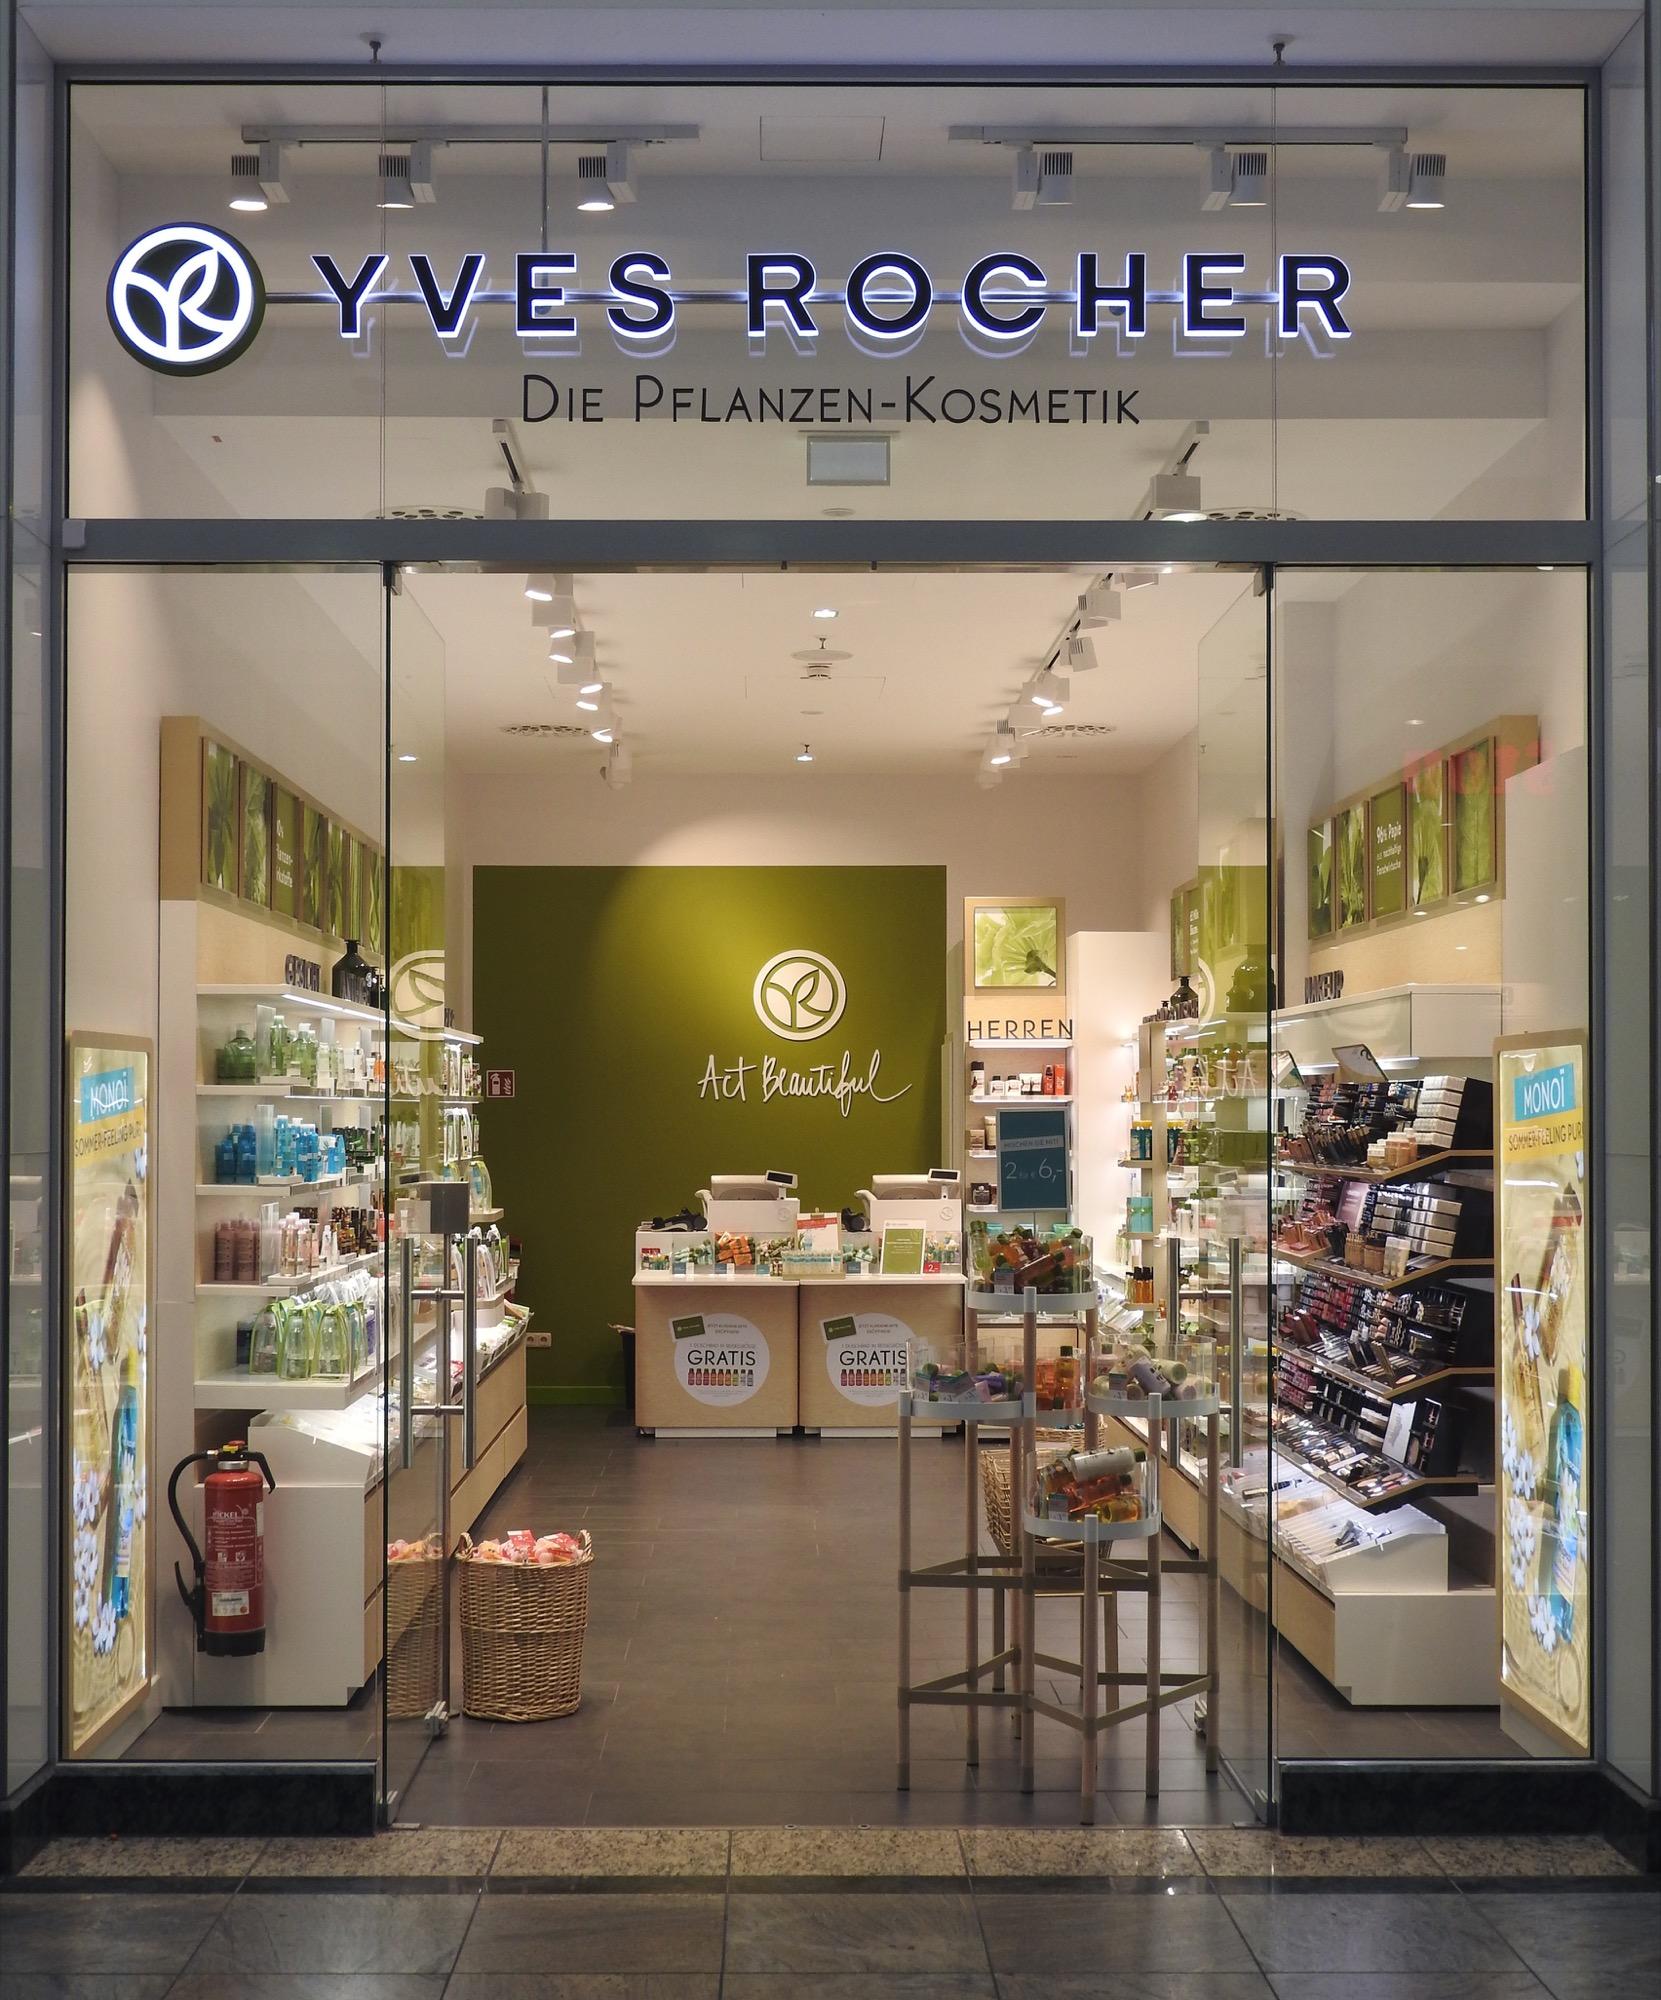 Yves Rocher Oberhausen 5 1